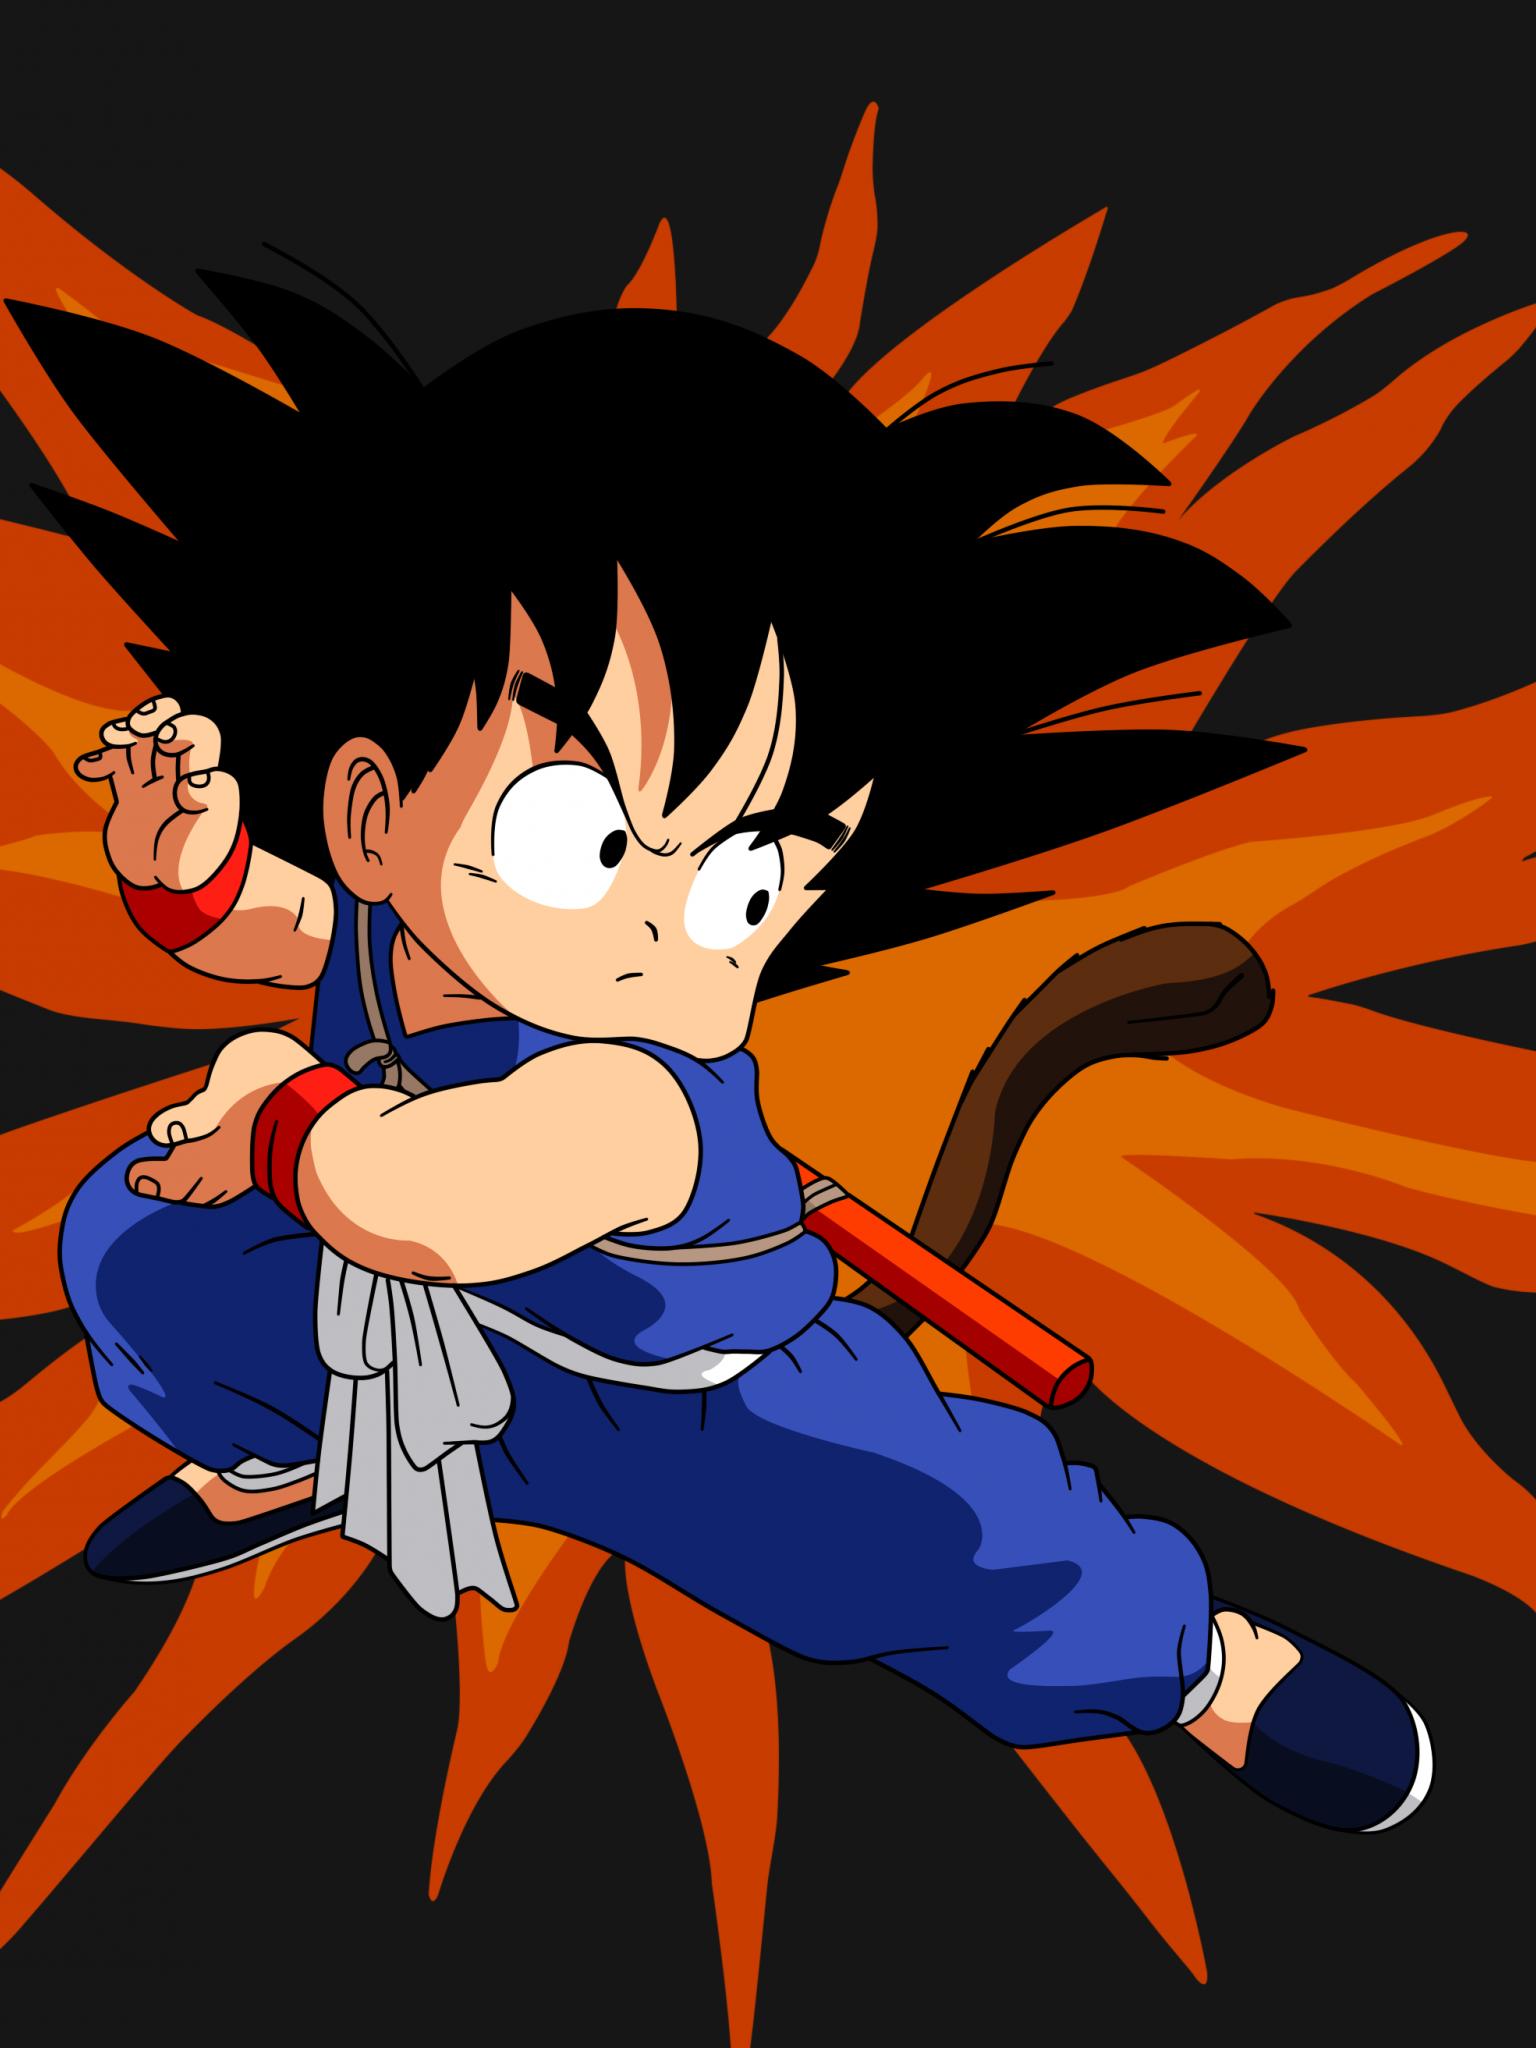 Free Download Dragon Ball Kid Goku 24 By Superjmanplay2 3500x2625